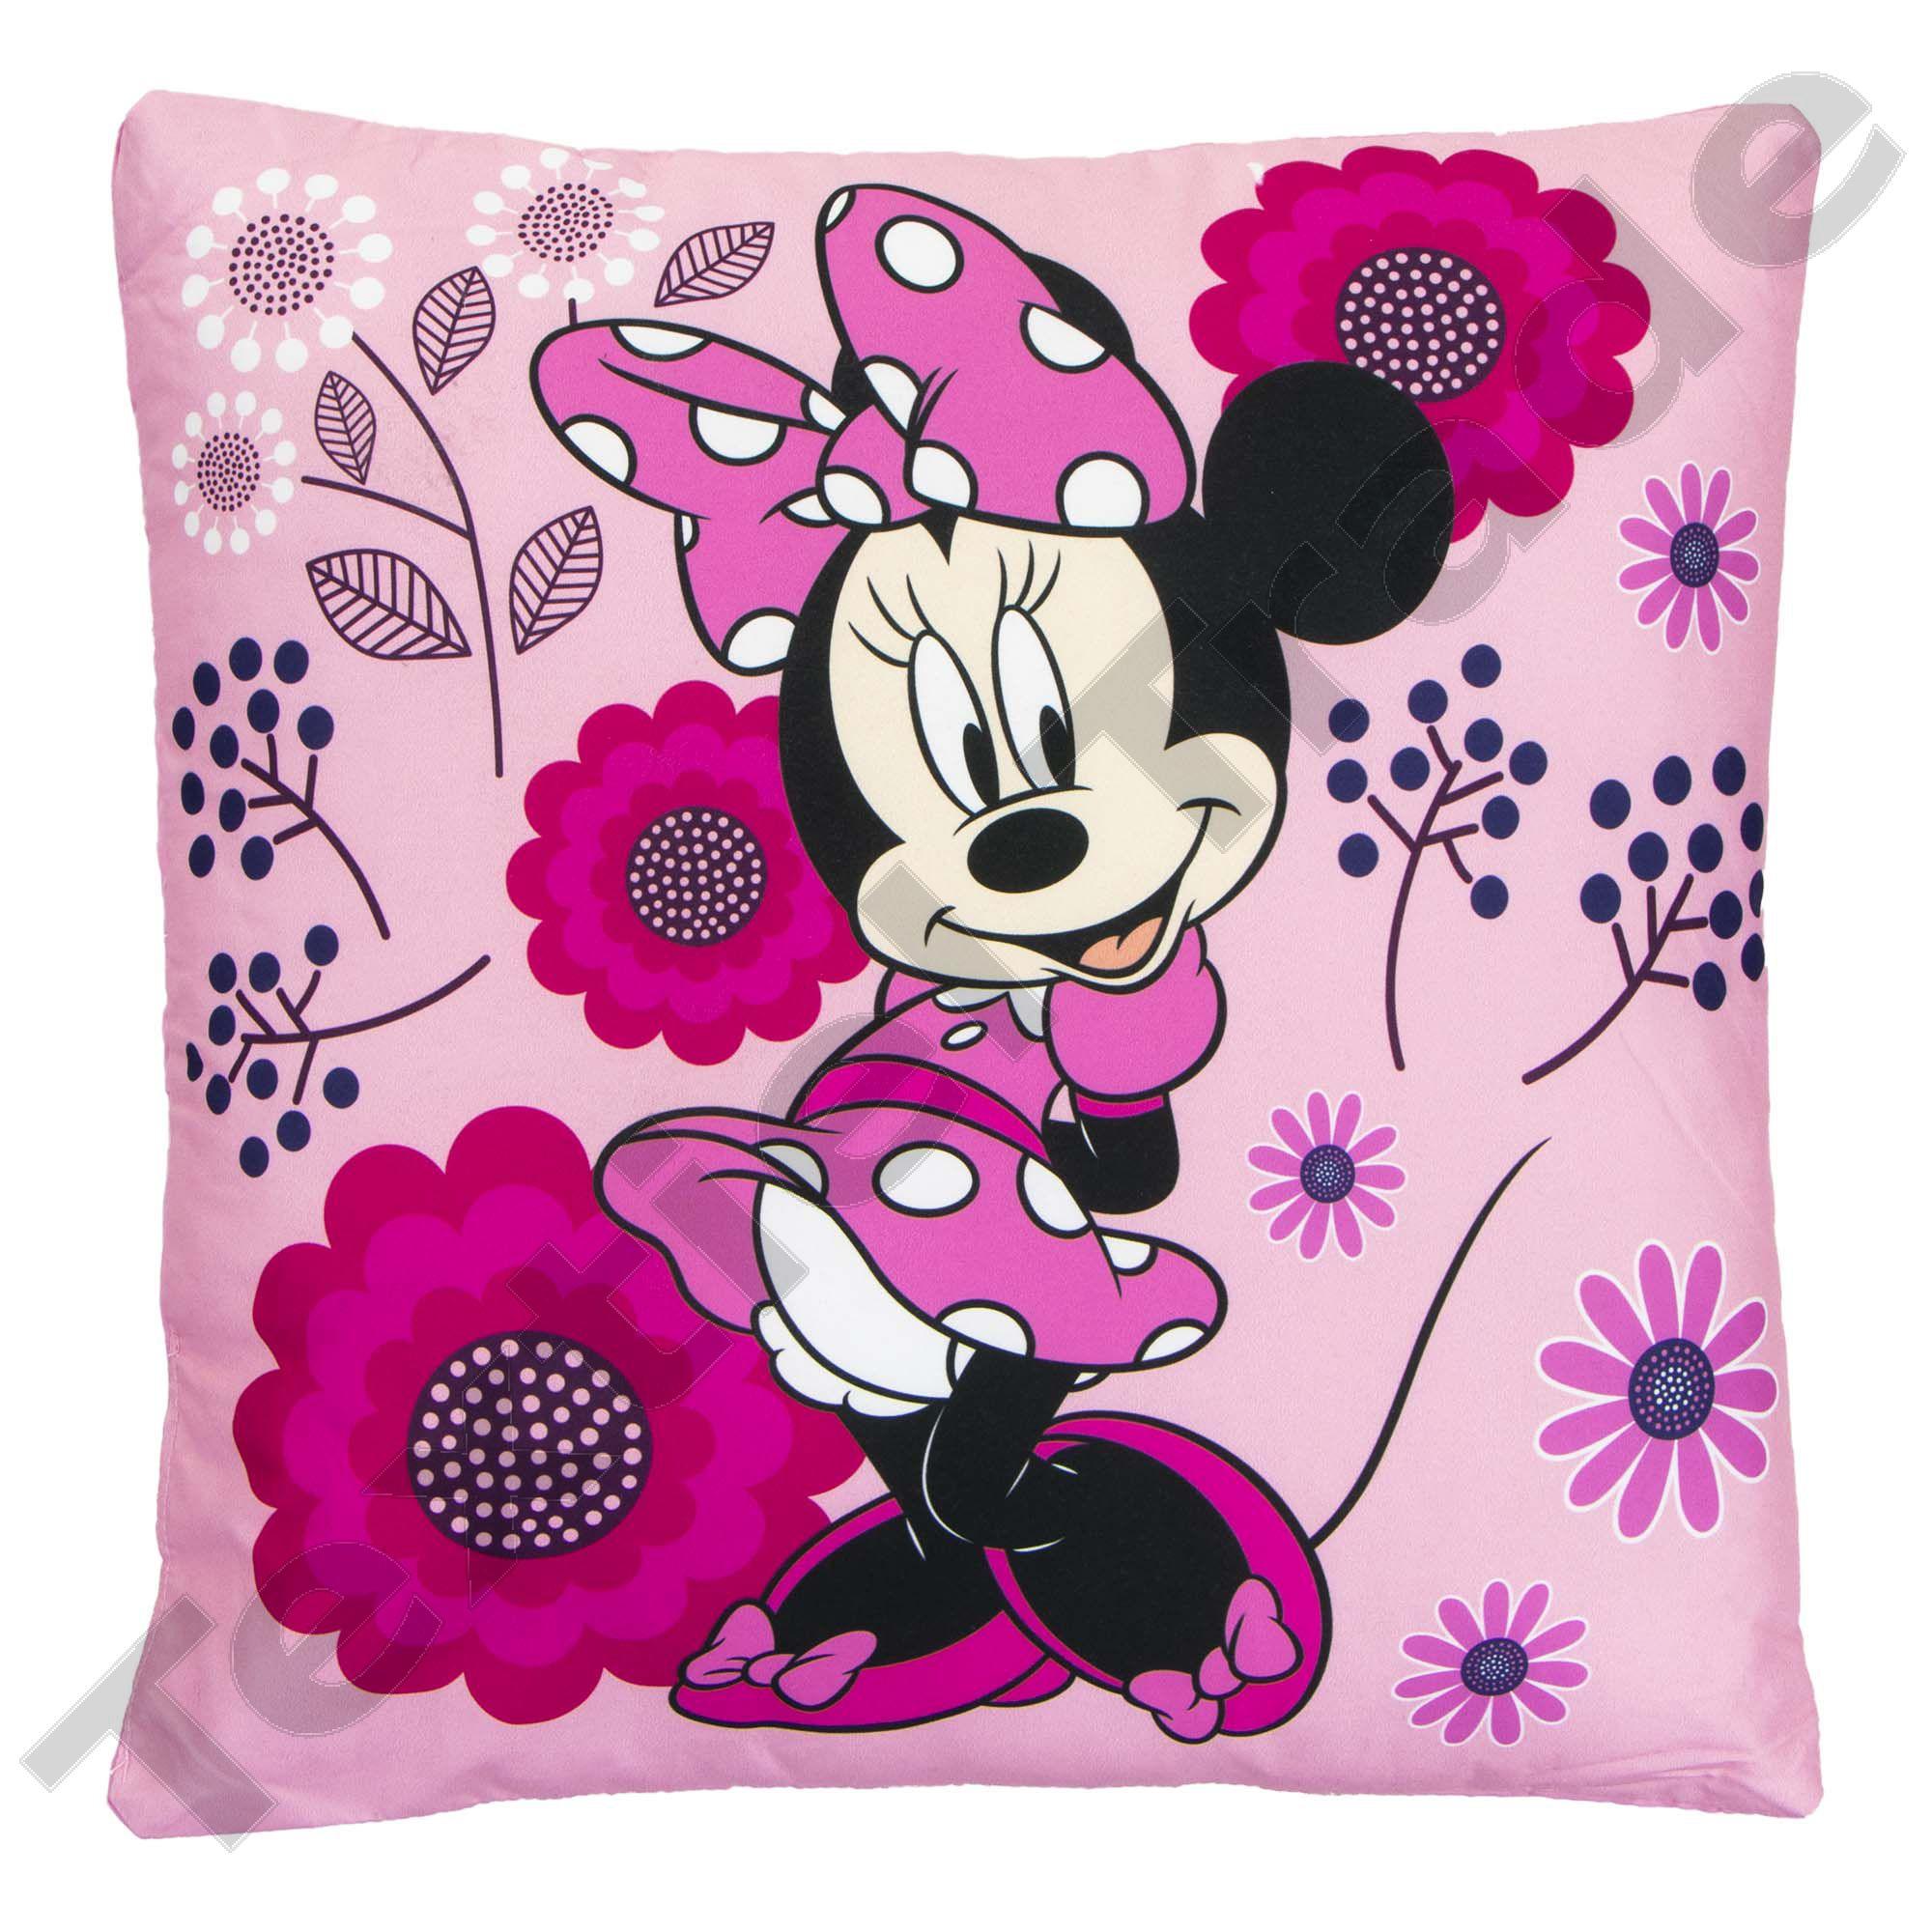 wholesale minnie mouse pyjama cushion